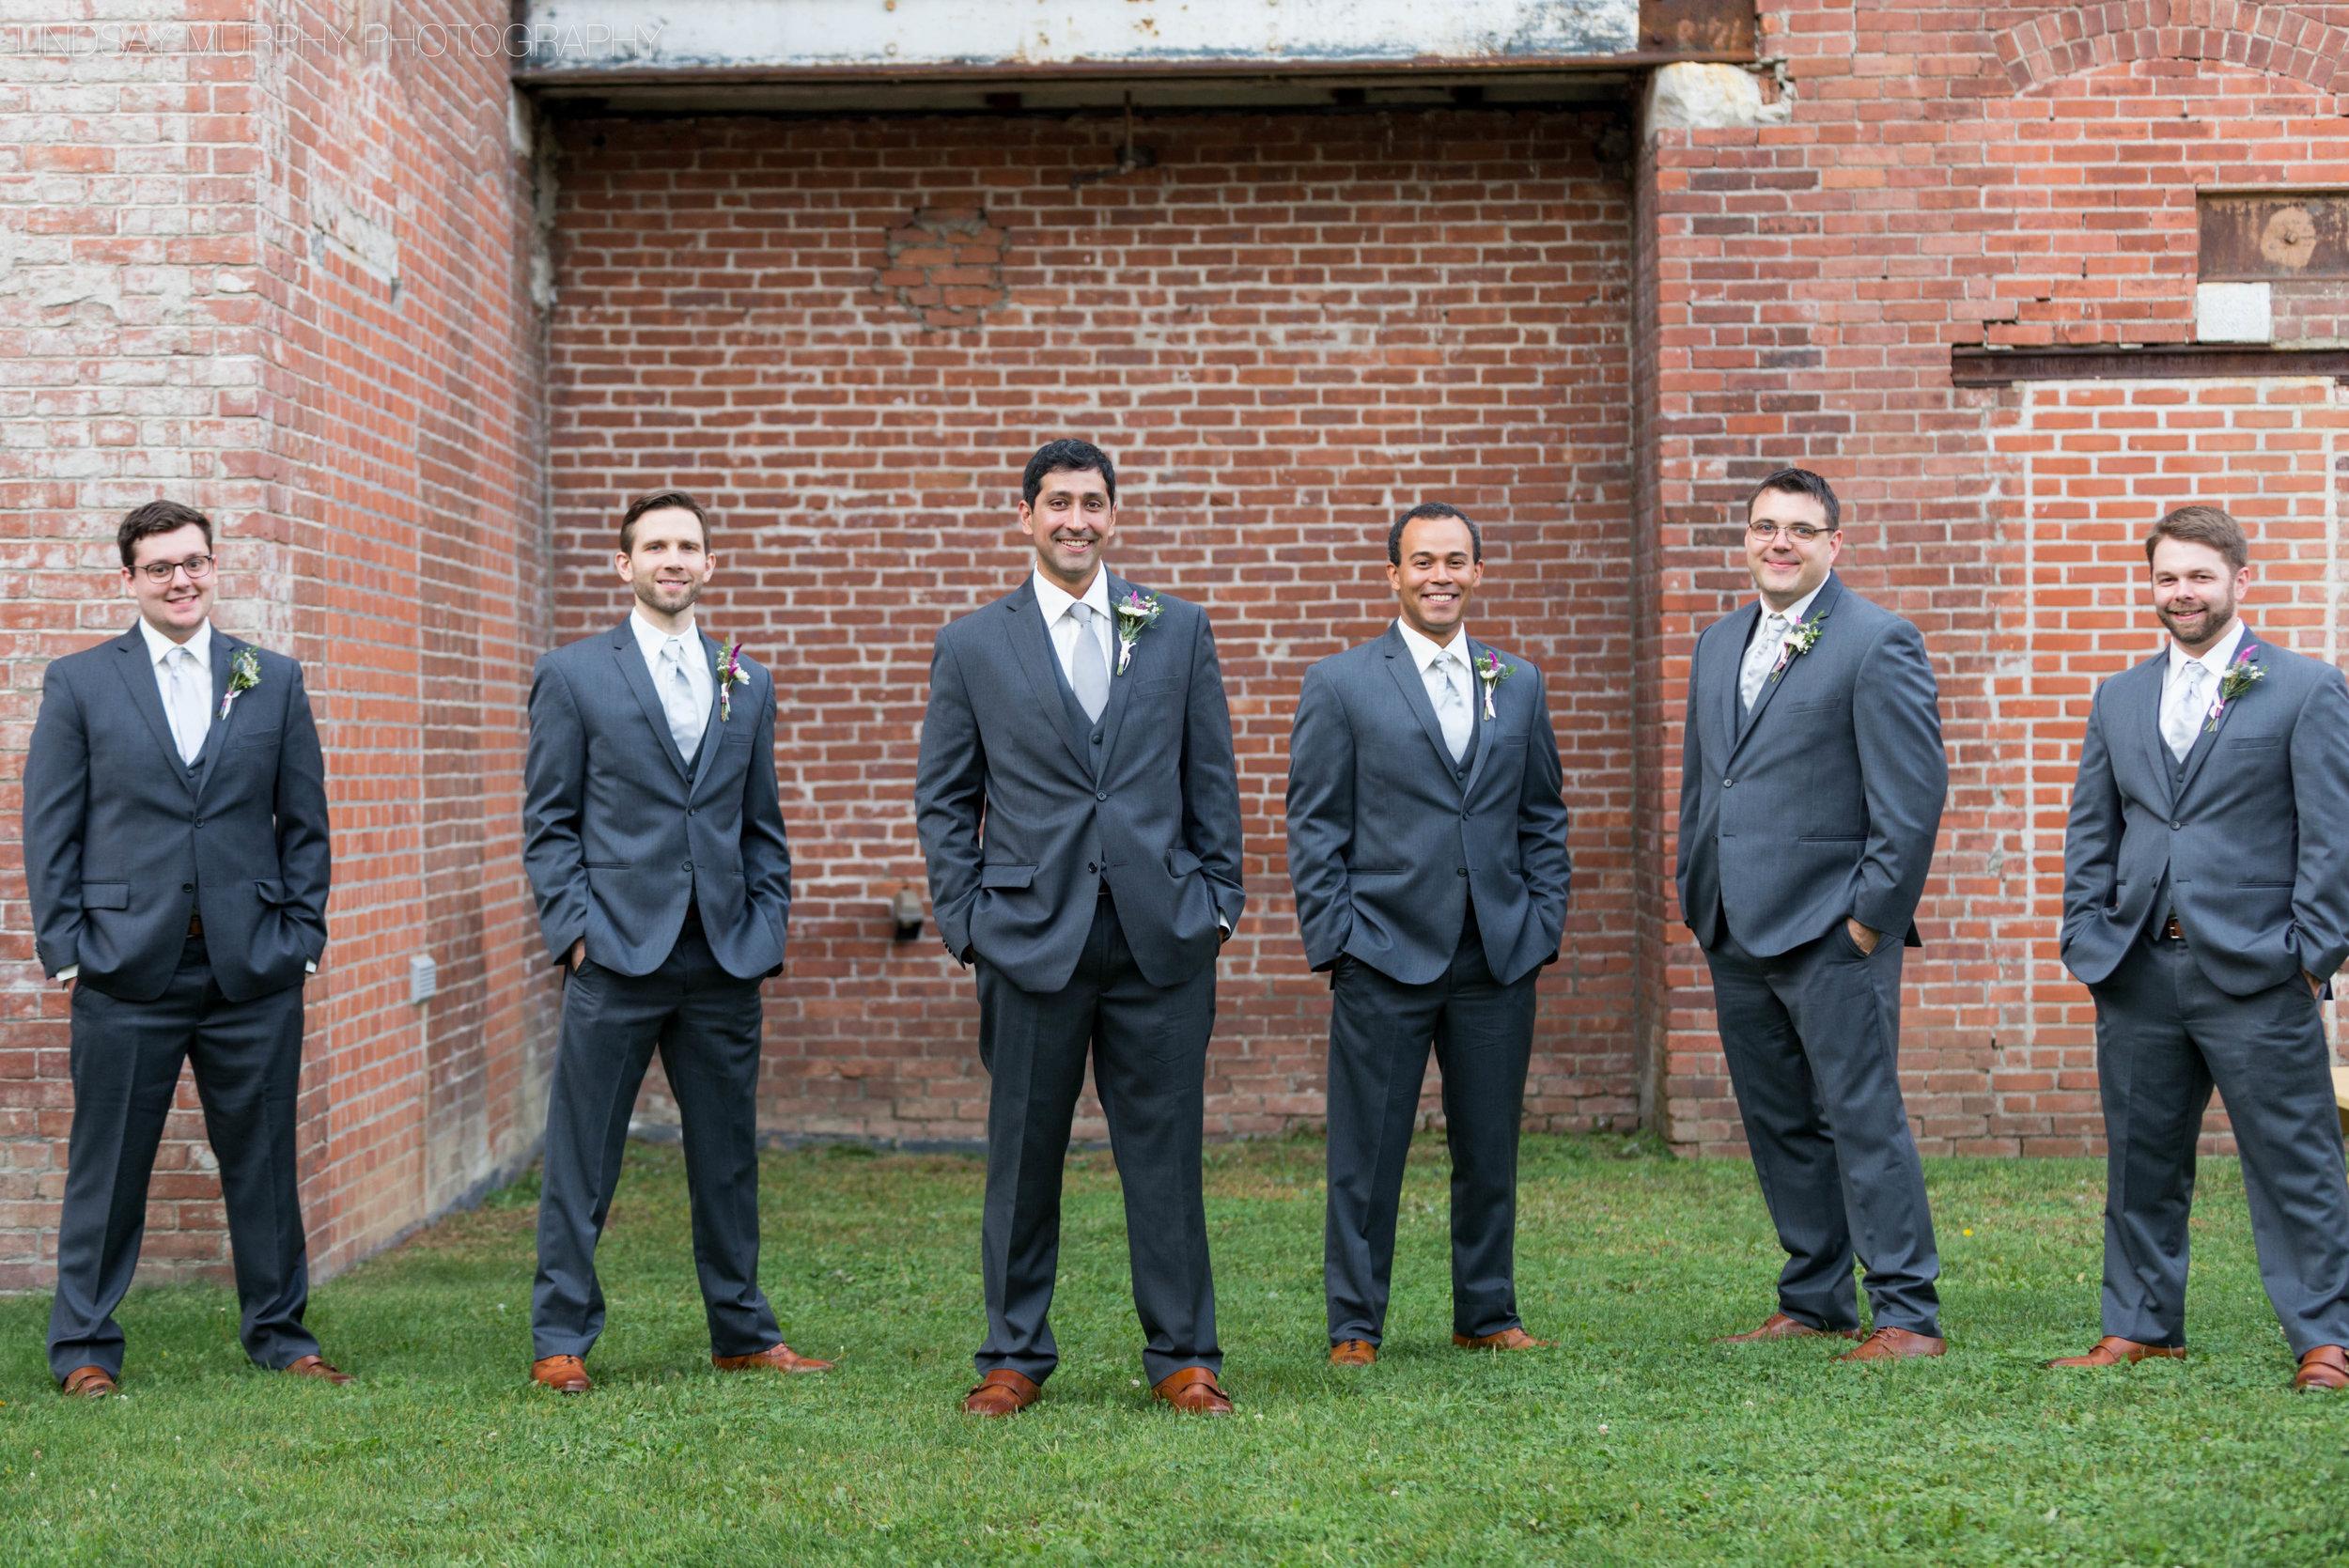 New_England_wedding-16.jpg